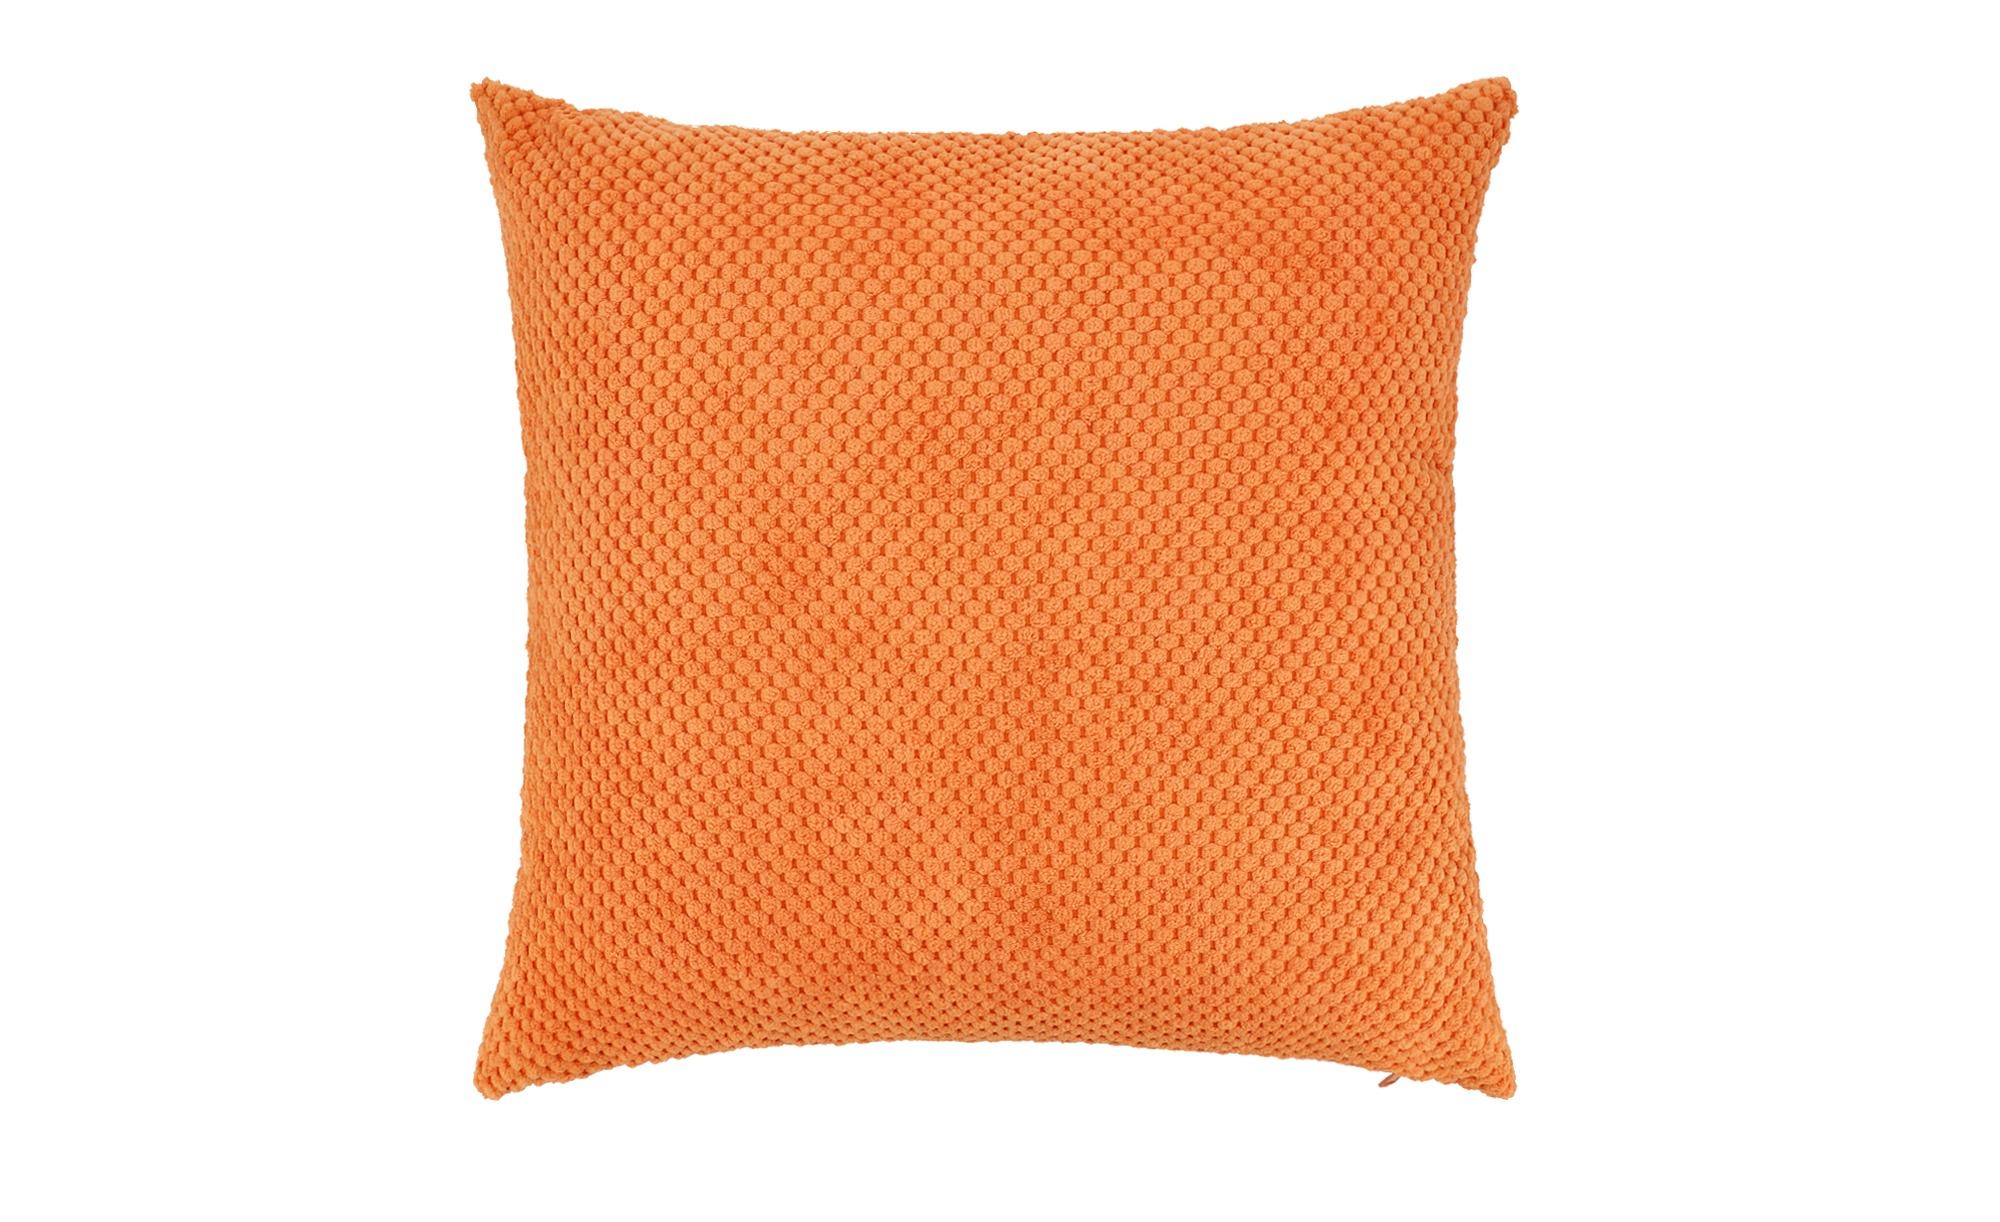 HOME STORY Kissen  Lisa ¦ orange ¦ 100% Polyester, 250gr. ¦ Maße (cm): B: 40 Heimtextilien > Kissen > Dekokissen - Höffner